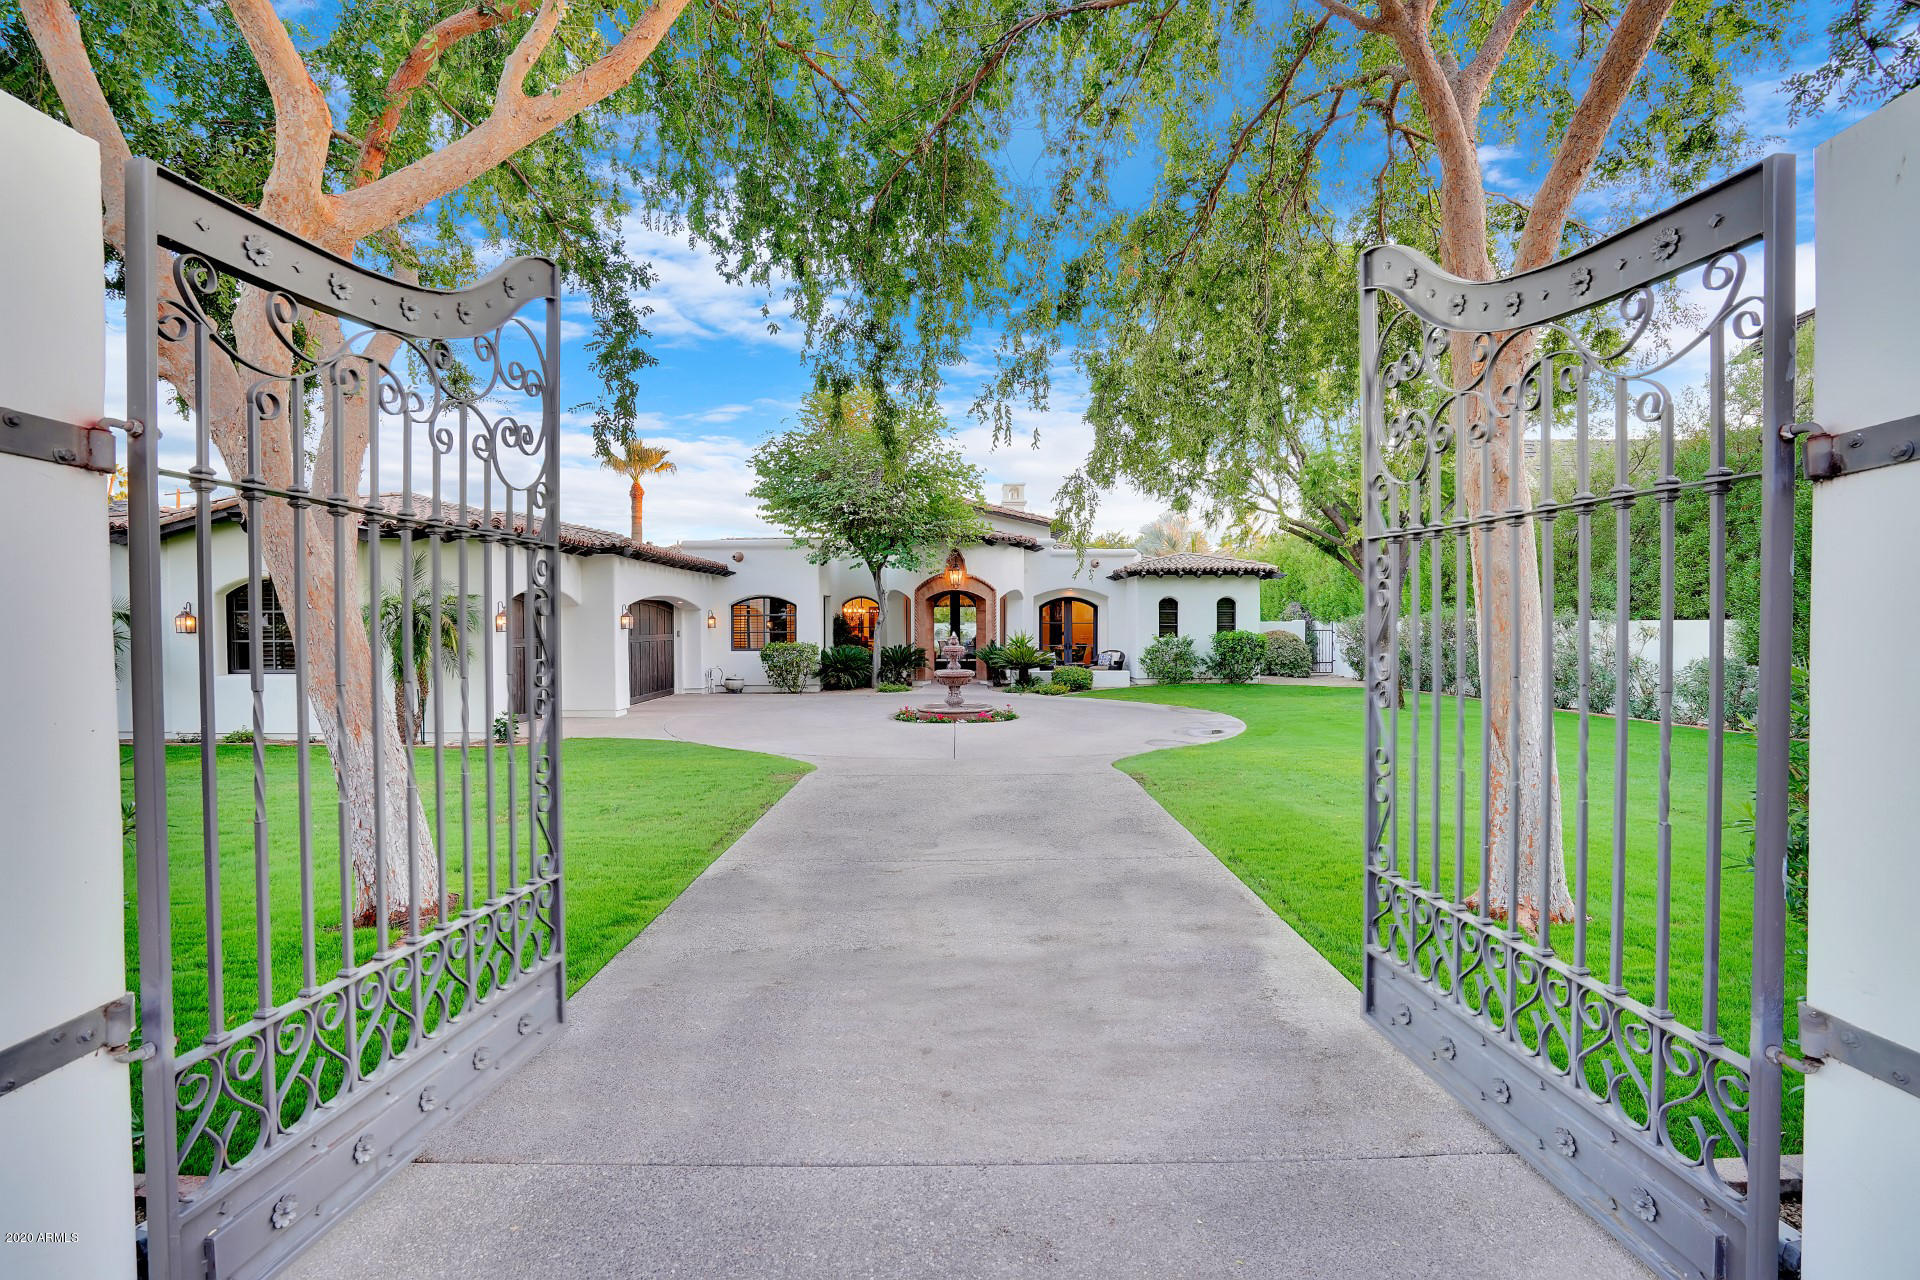 MLS 6146527 6109 E EXETER Boulevard, Scottsdale, AZ 85251 Scottsdale AZ Old Town Scottsdale